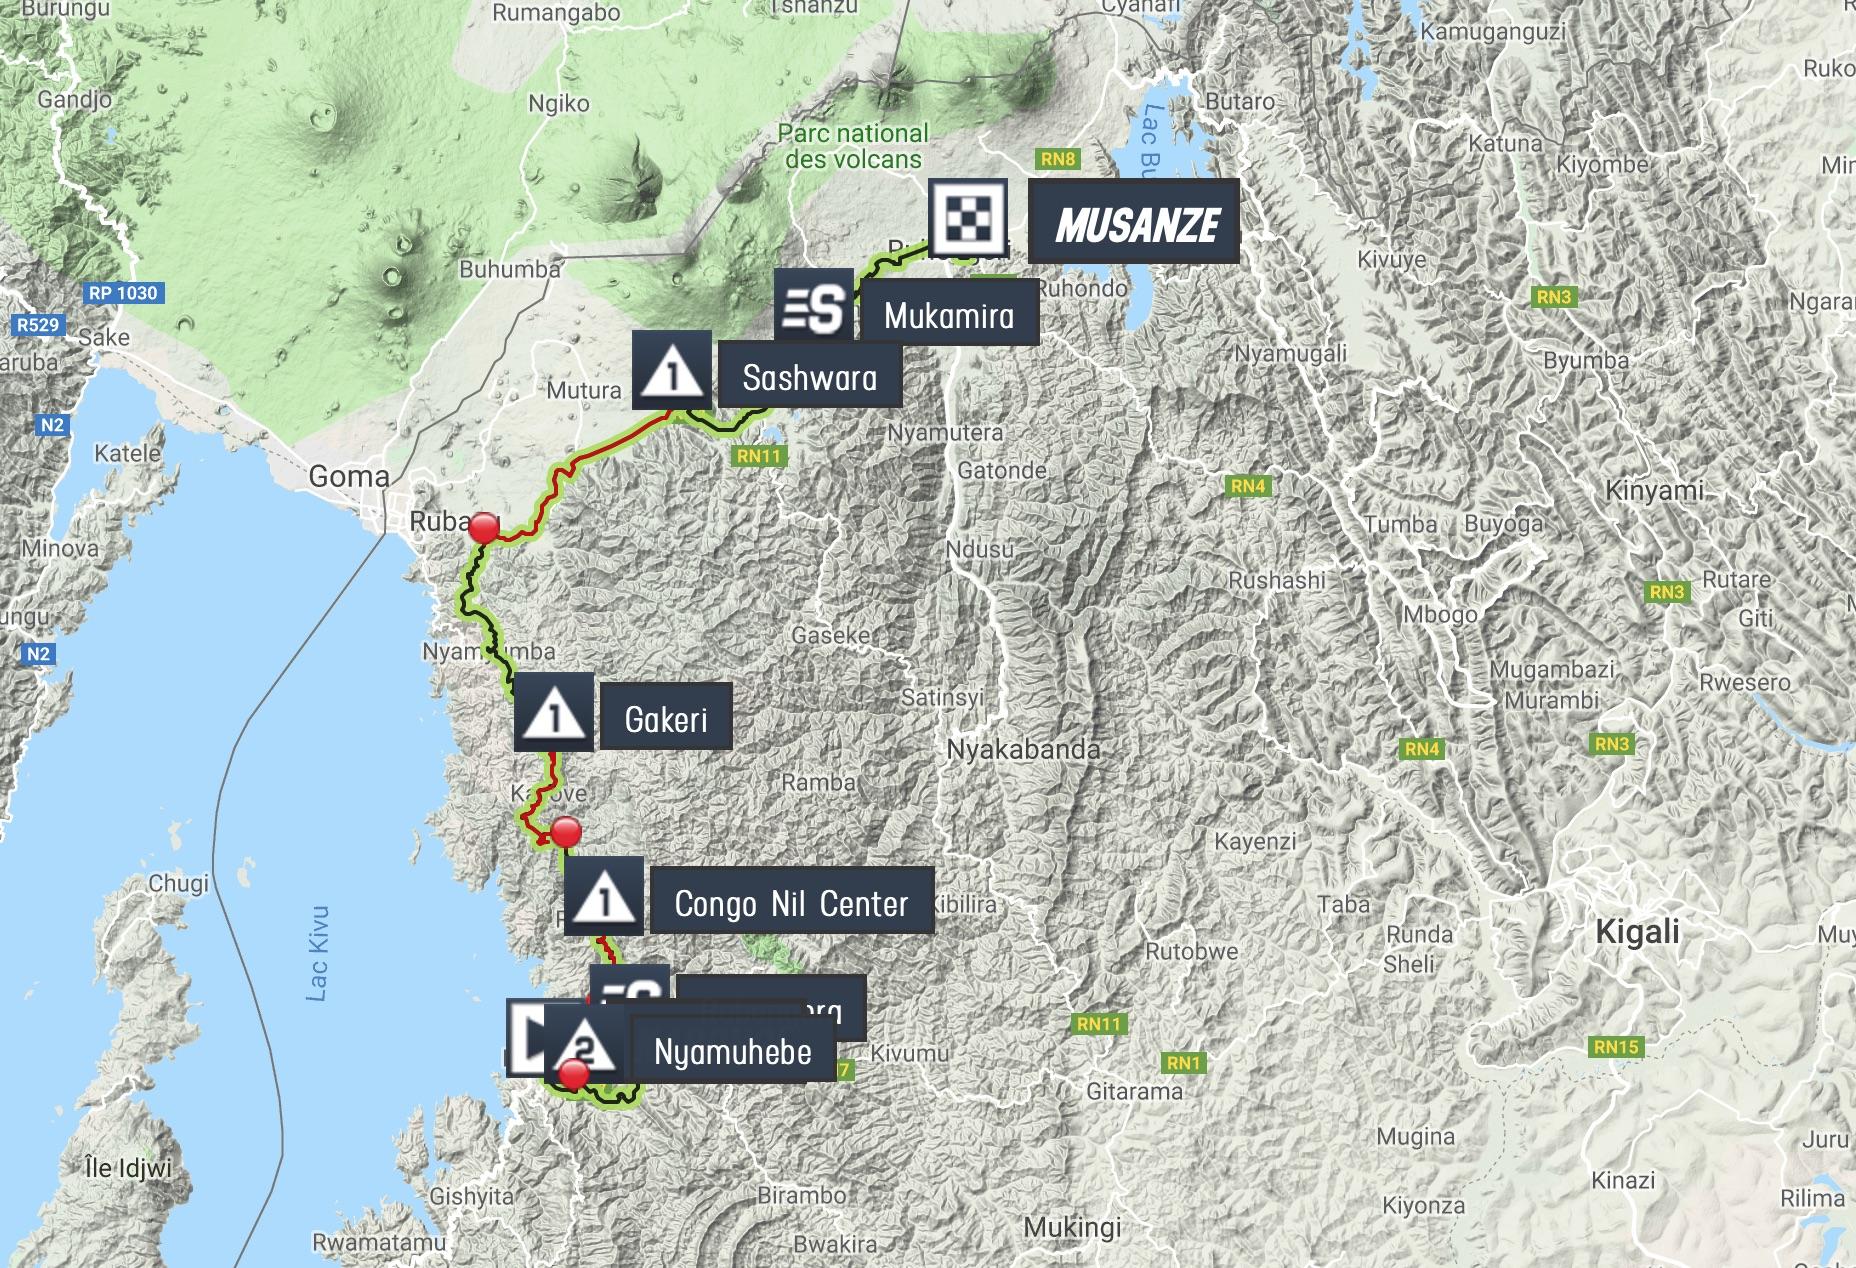 https://www.procyclingstats.com/images/profiles/ap/dd/tour-of-rwanda-2019-stage-5-map-636f759e64.jpg